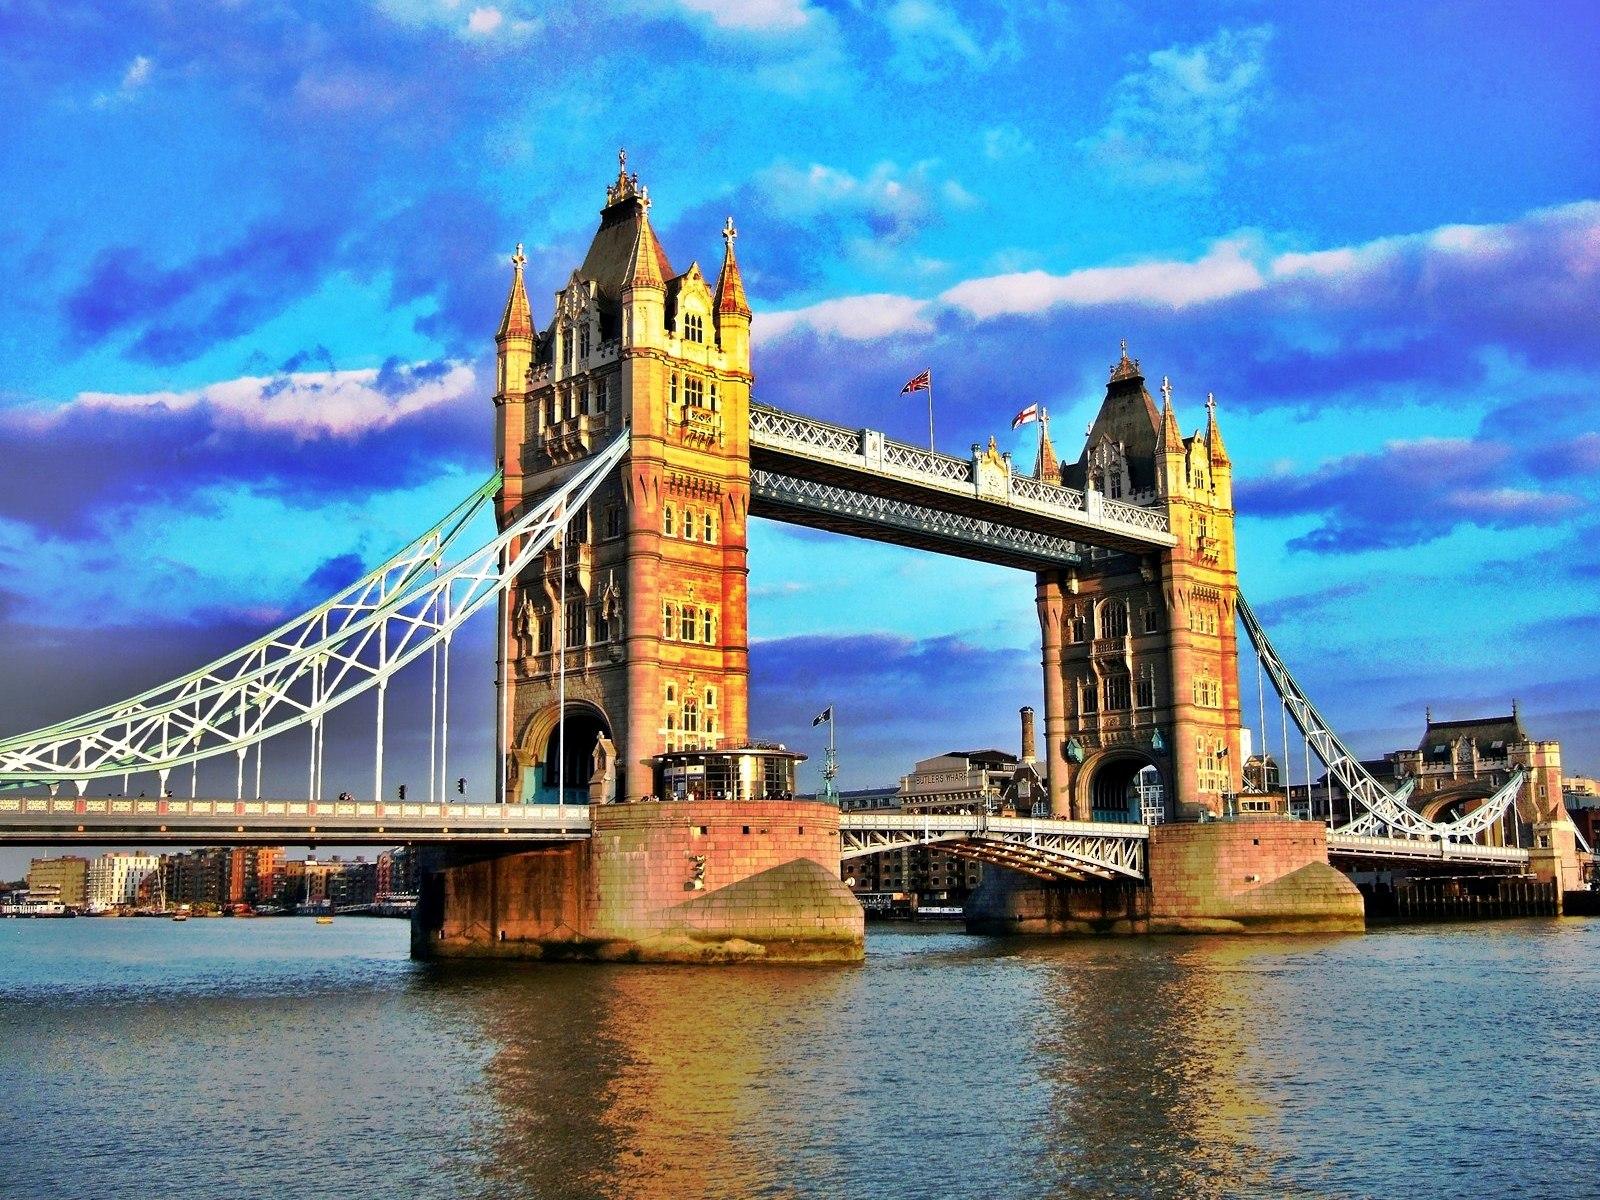 London Bridge Wallpaper | Wallpapers in blog*